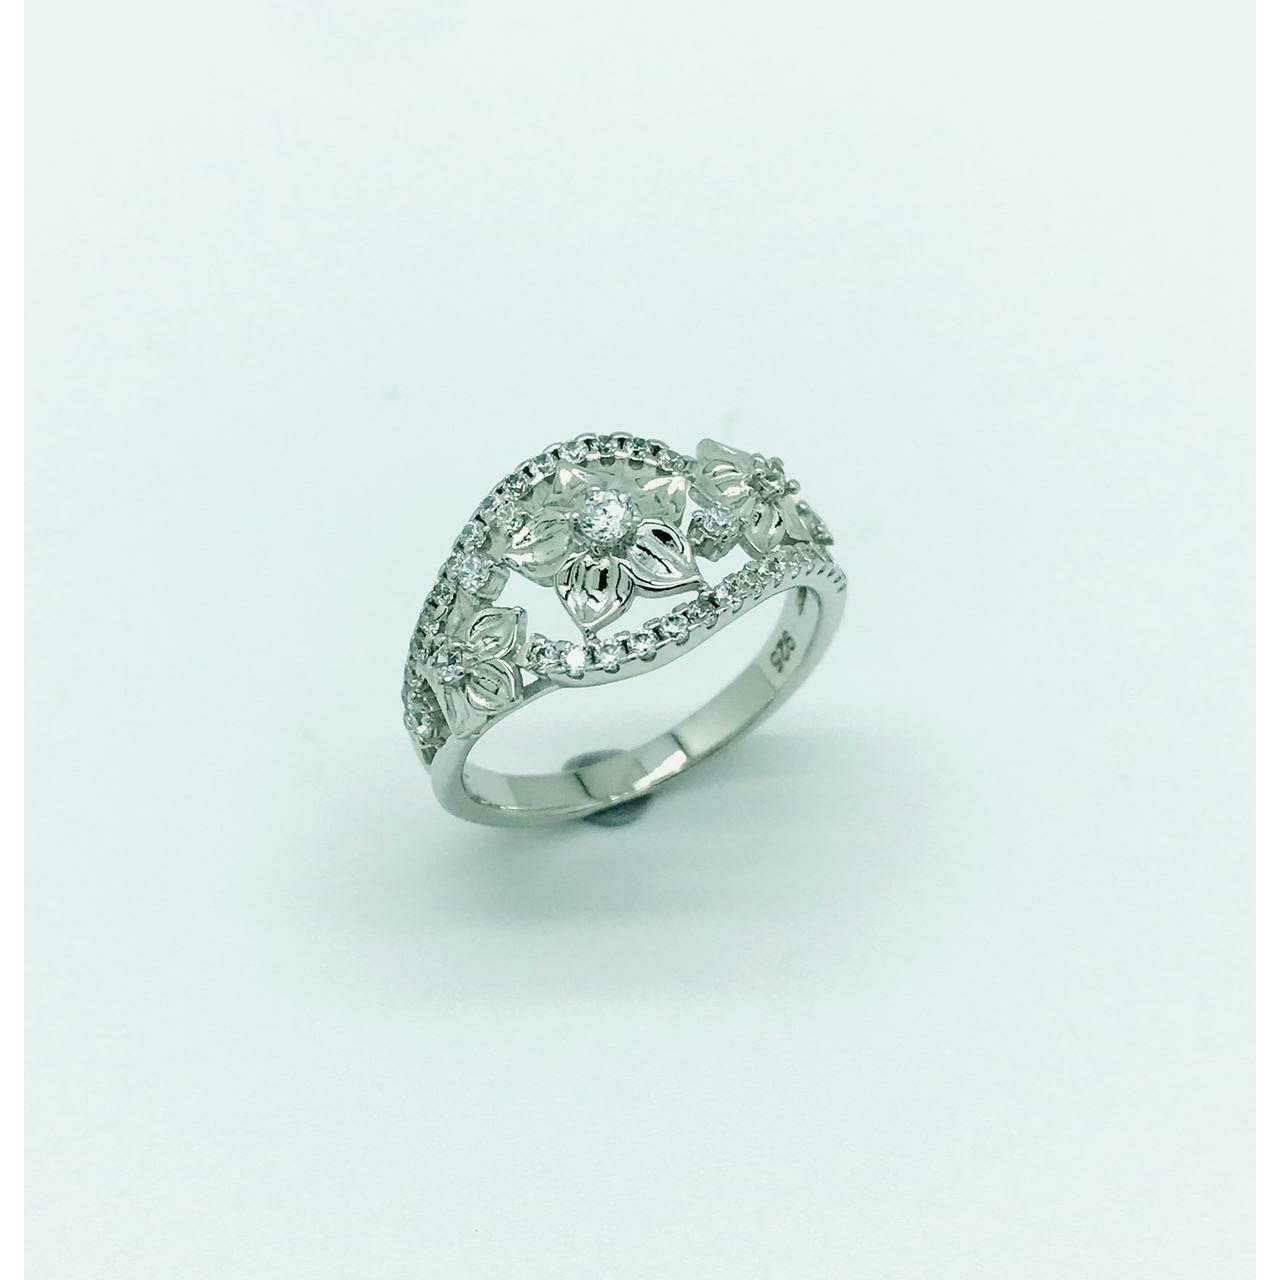 Micro Dimond 92.5 Ring Ms-4048